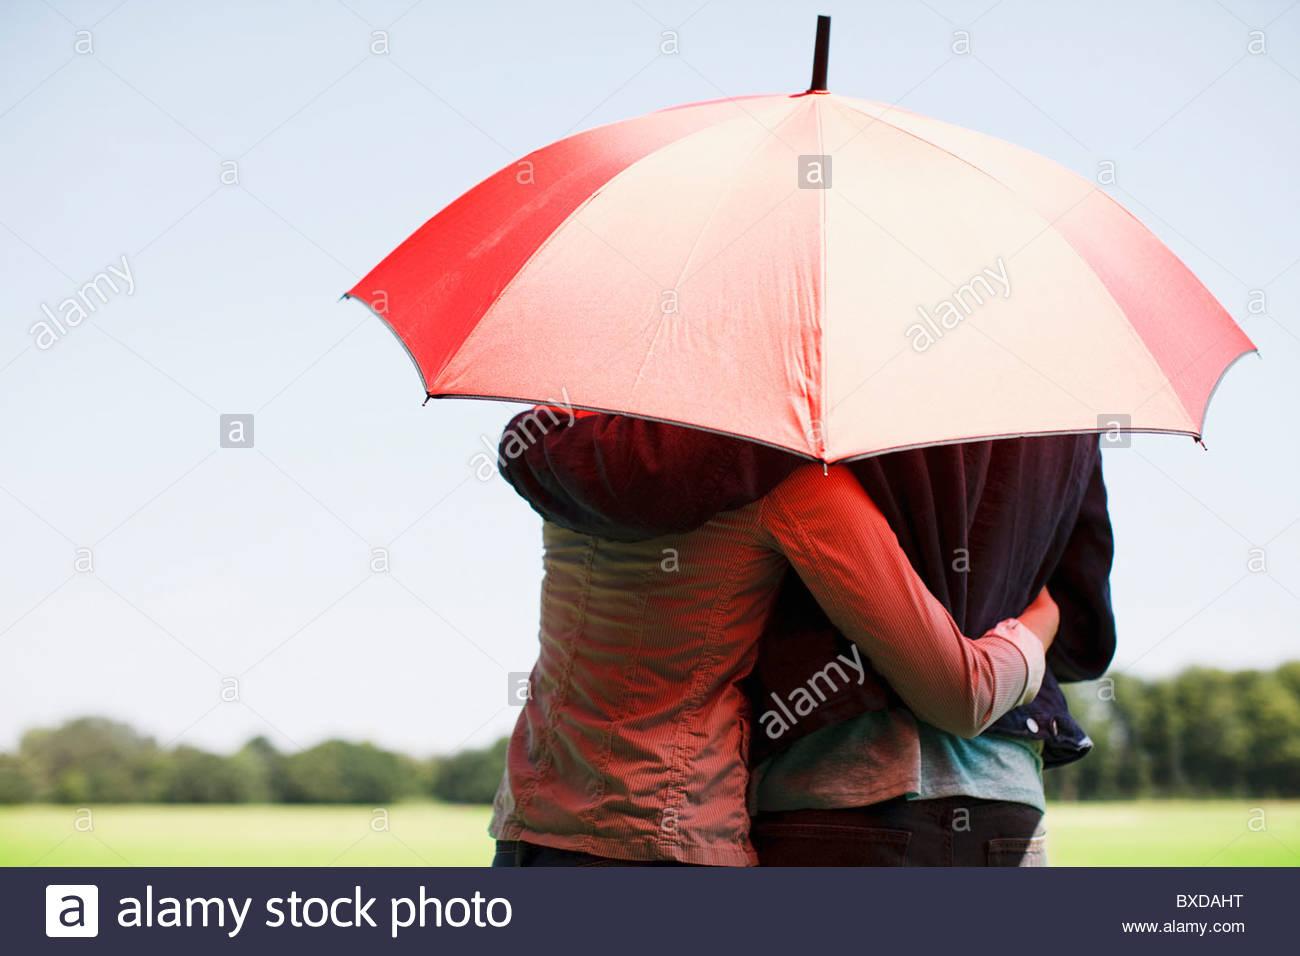 Couple hugging underneath red umbrella - Stock Image